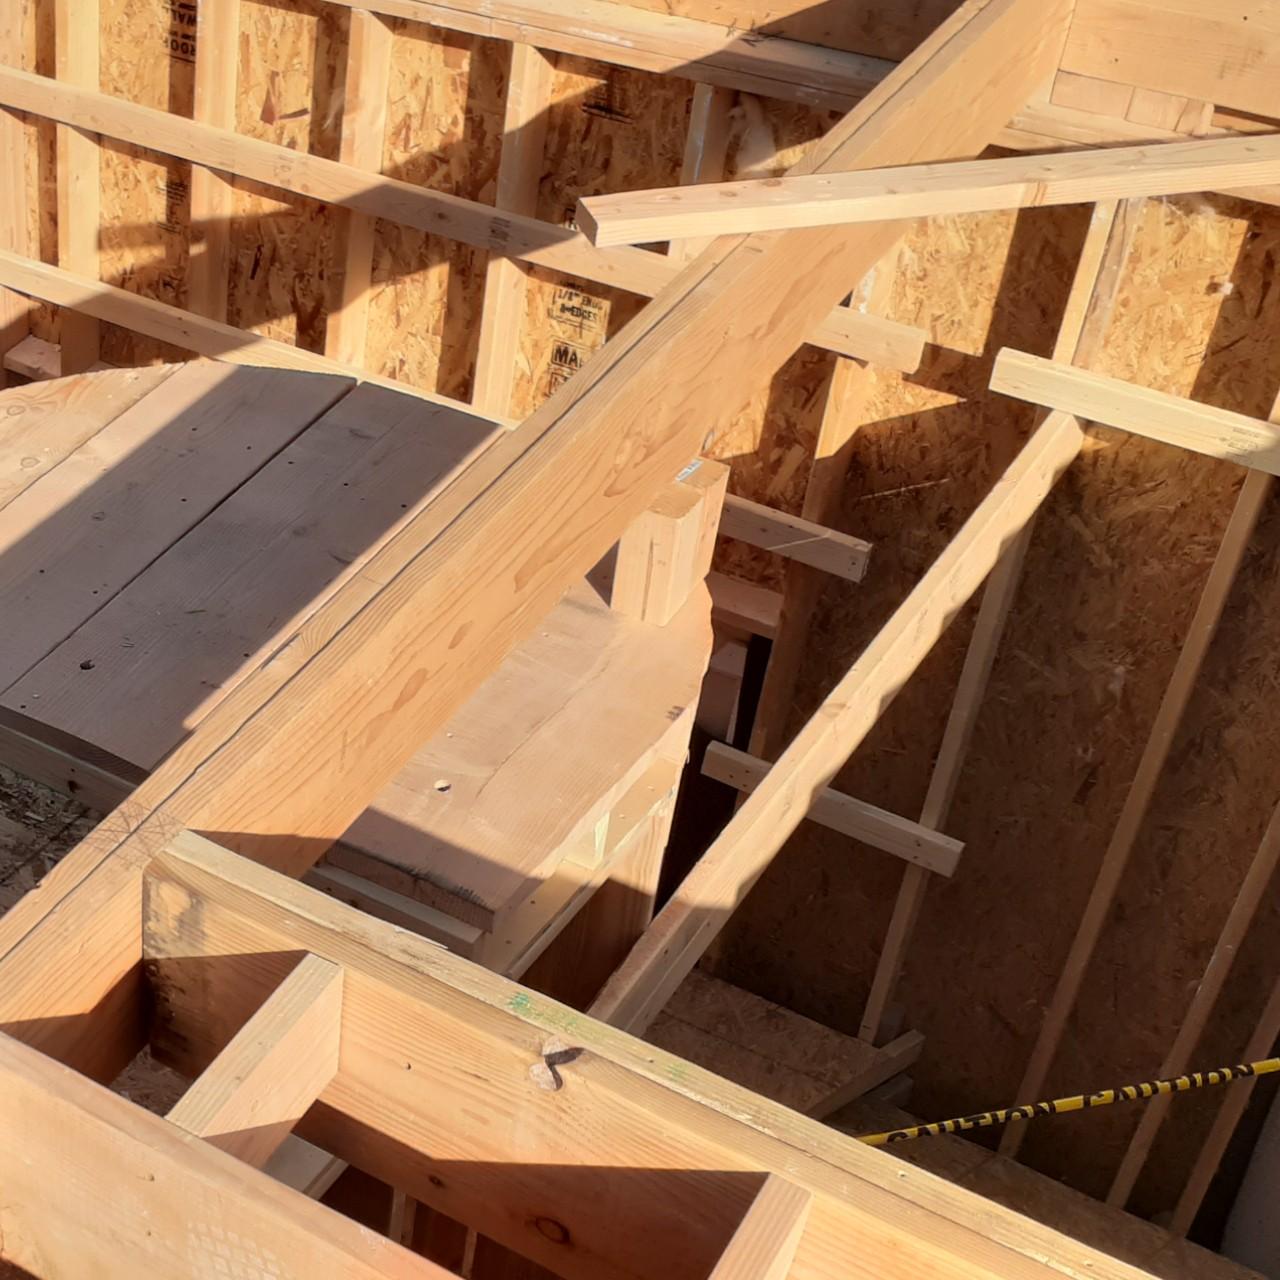 carpentry-wood-framing-second-floor-home-addition--framing-59